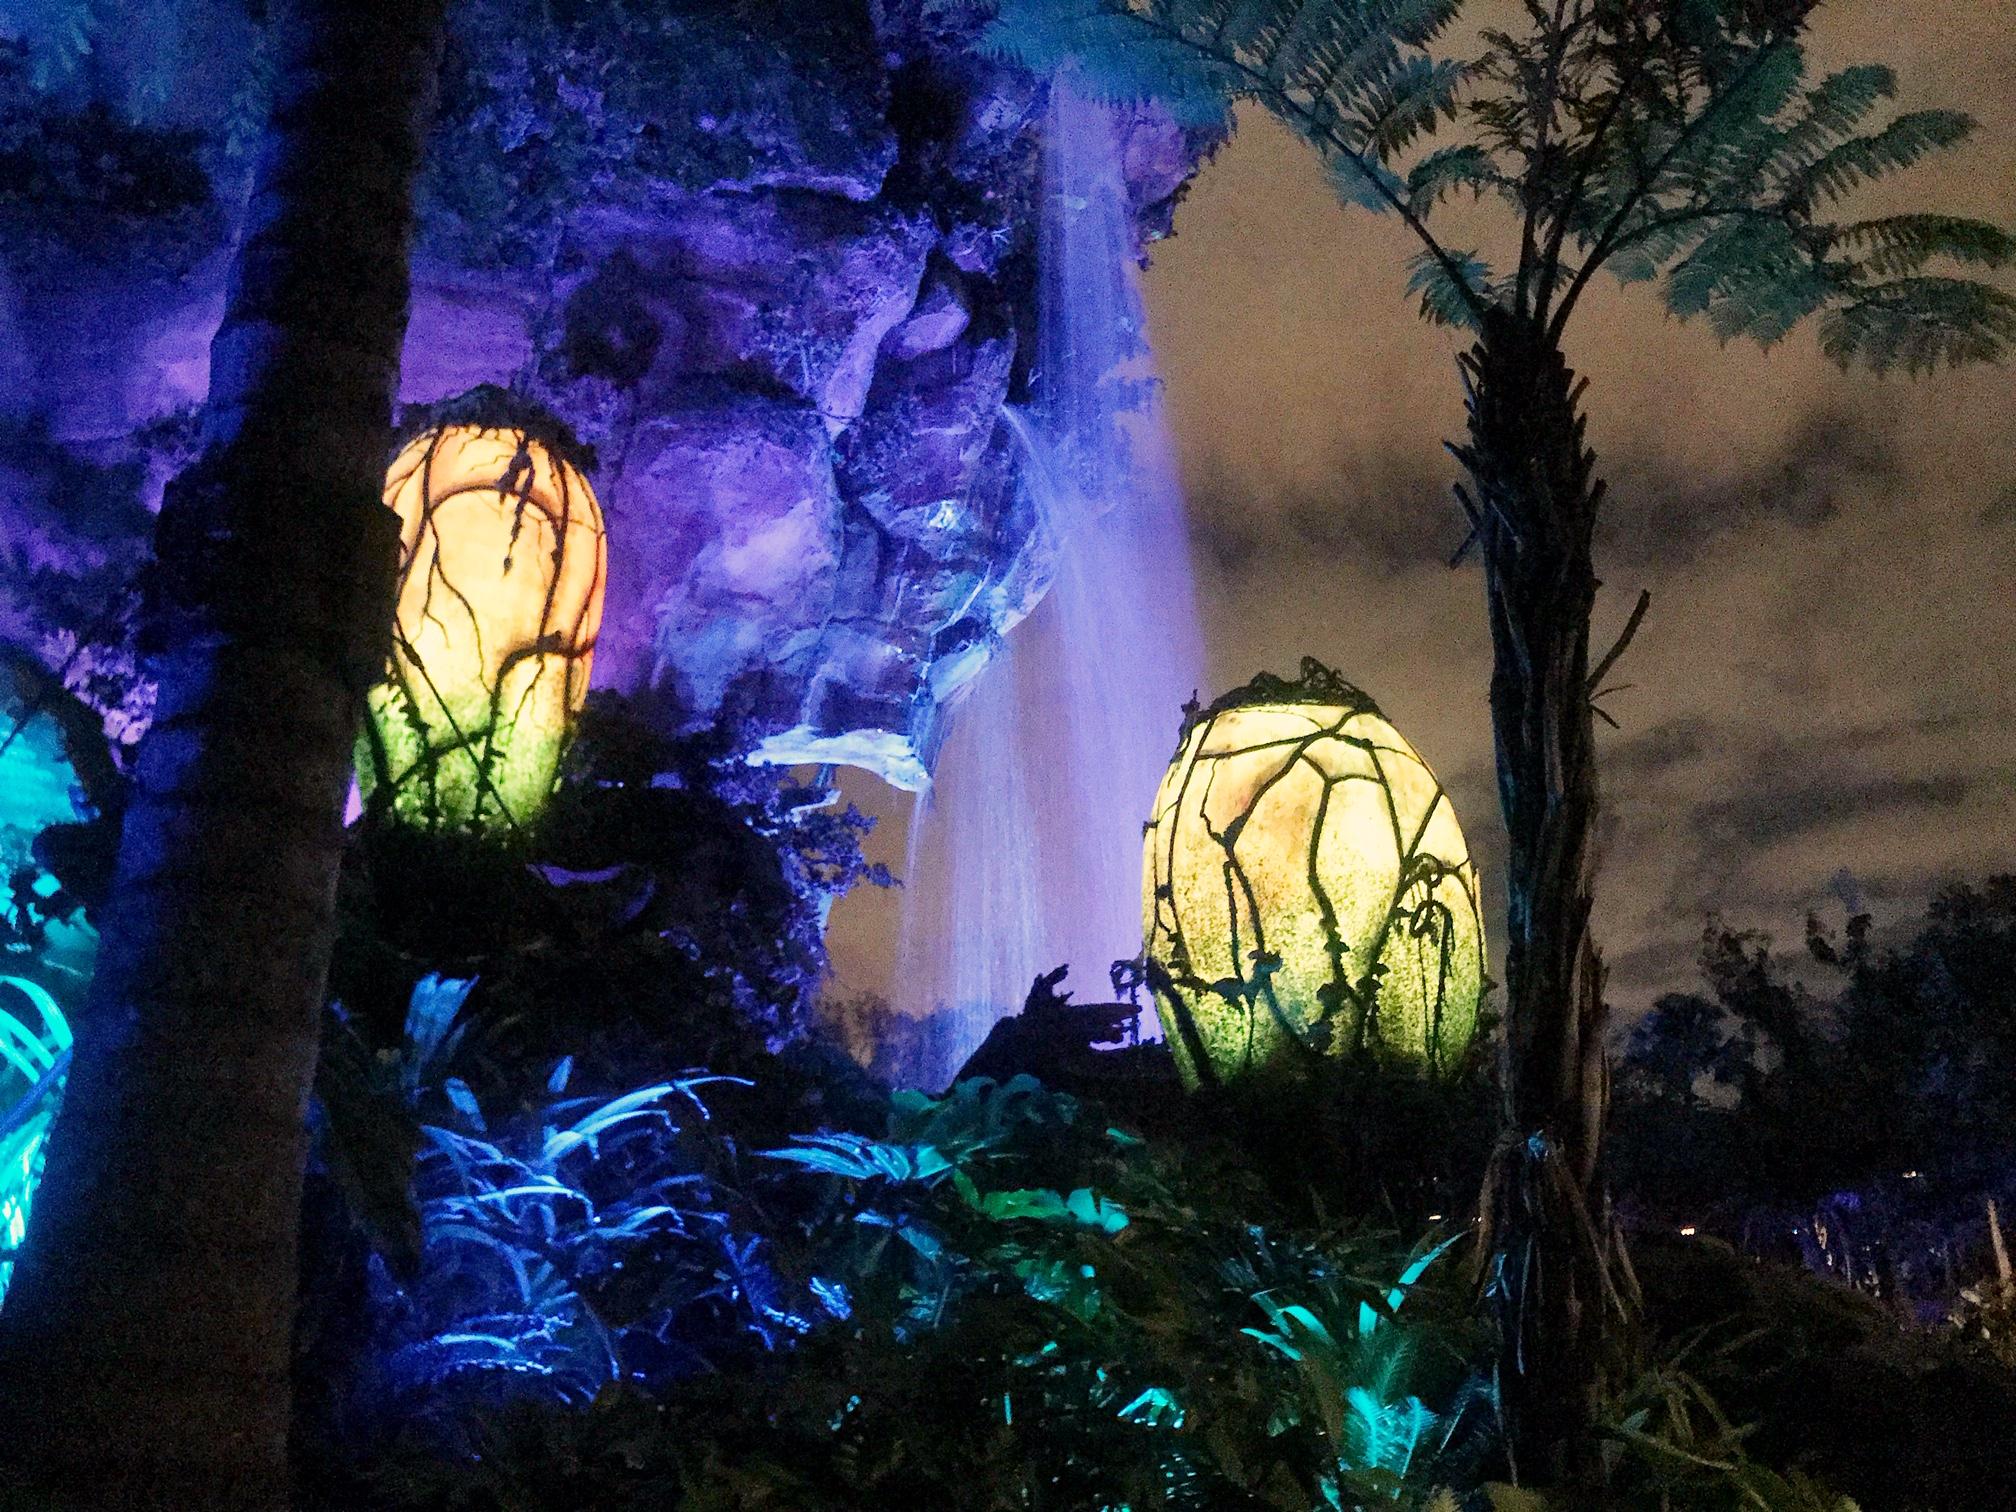 Pandora bioluminescent lights, #VisitPandora